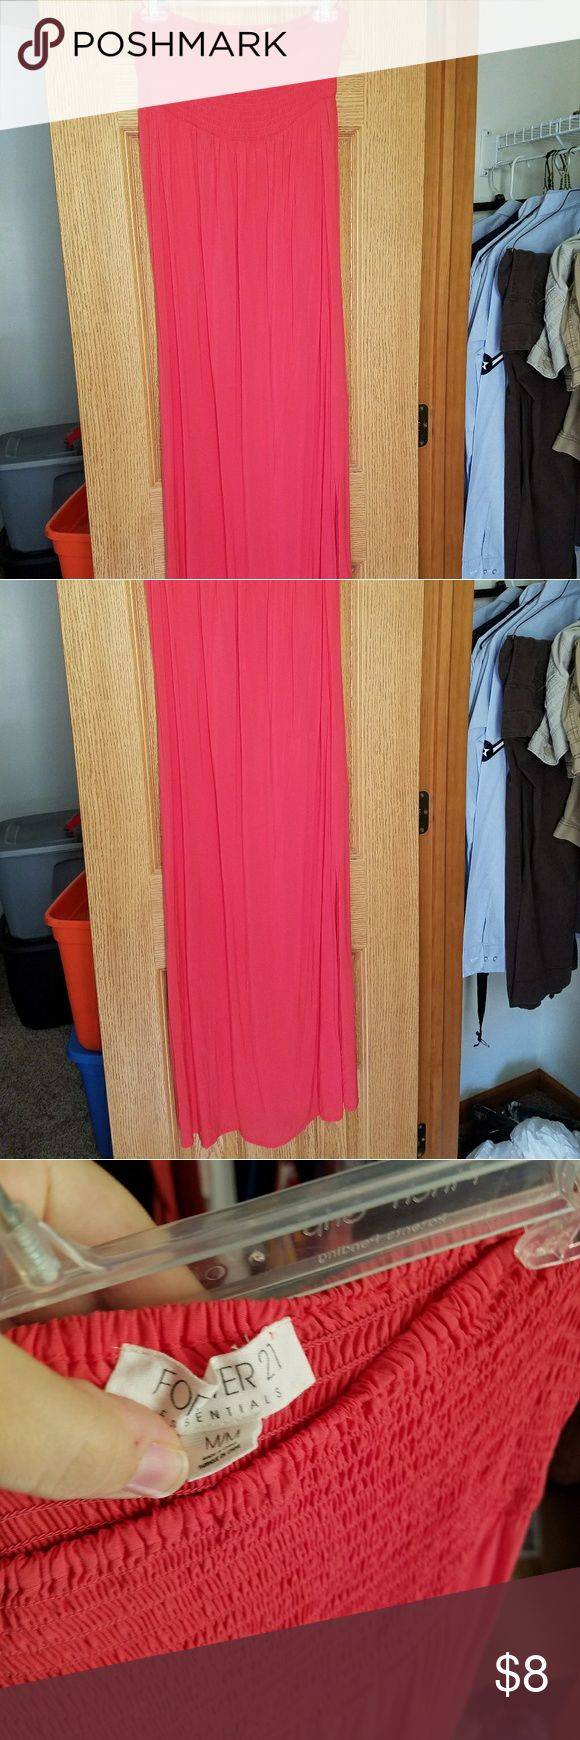 Strapless maxi dress Super comfy lightweight hot pink maxi dress. Excellent condition Forever 21 Dresses Maxi